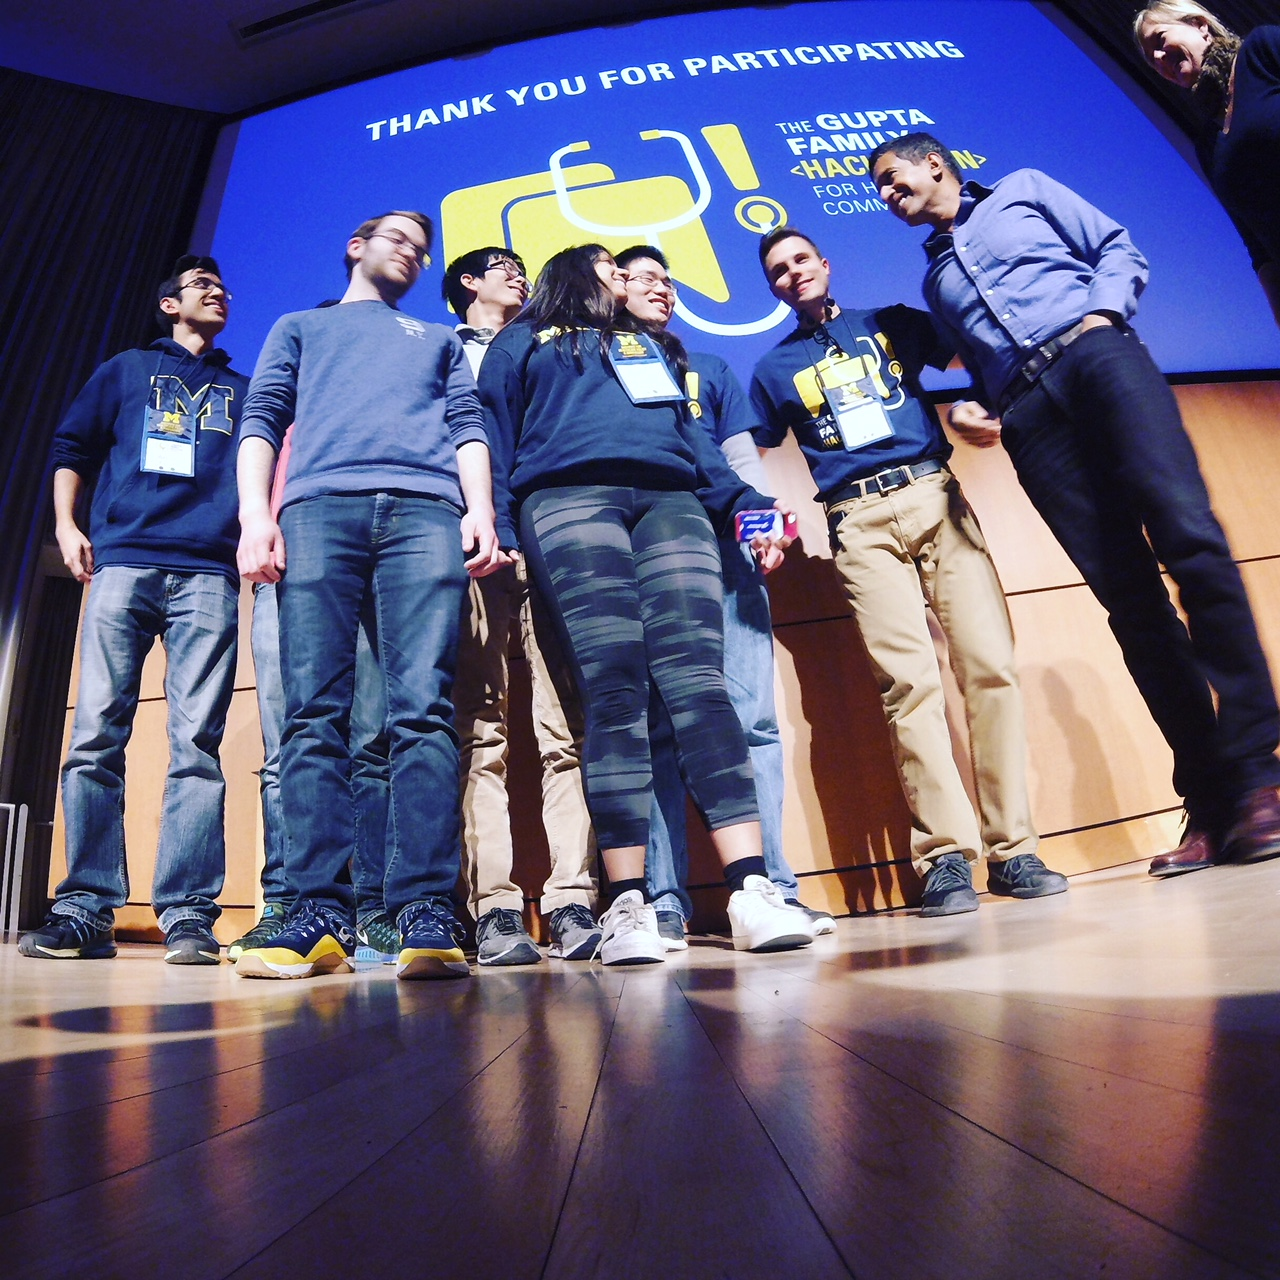 2018 Gupta Family Hackathon for Health Communication